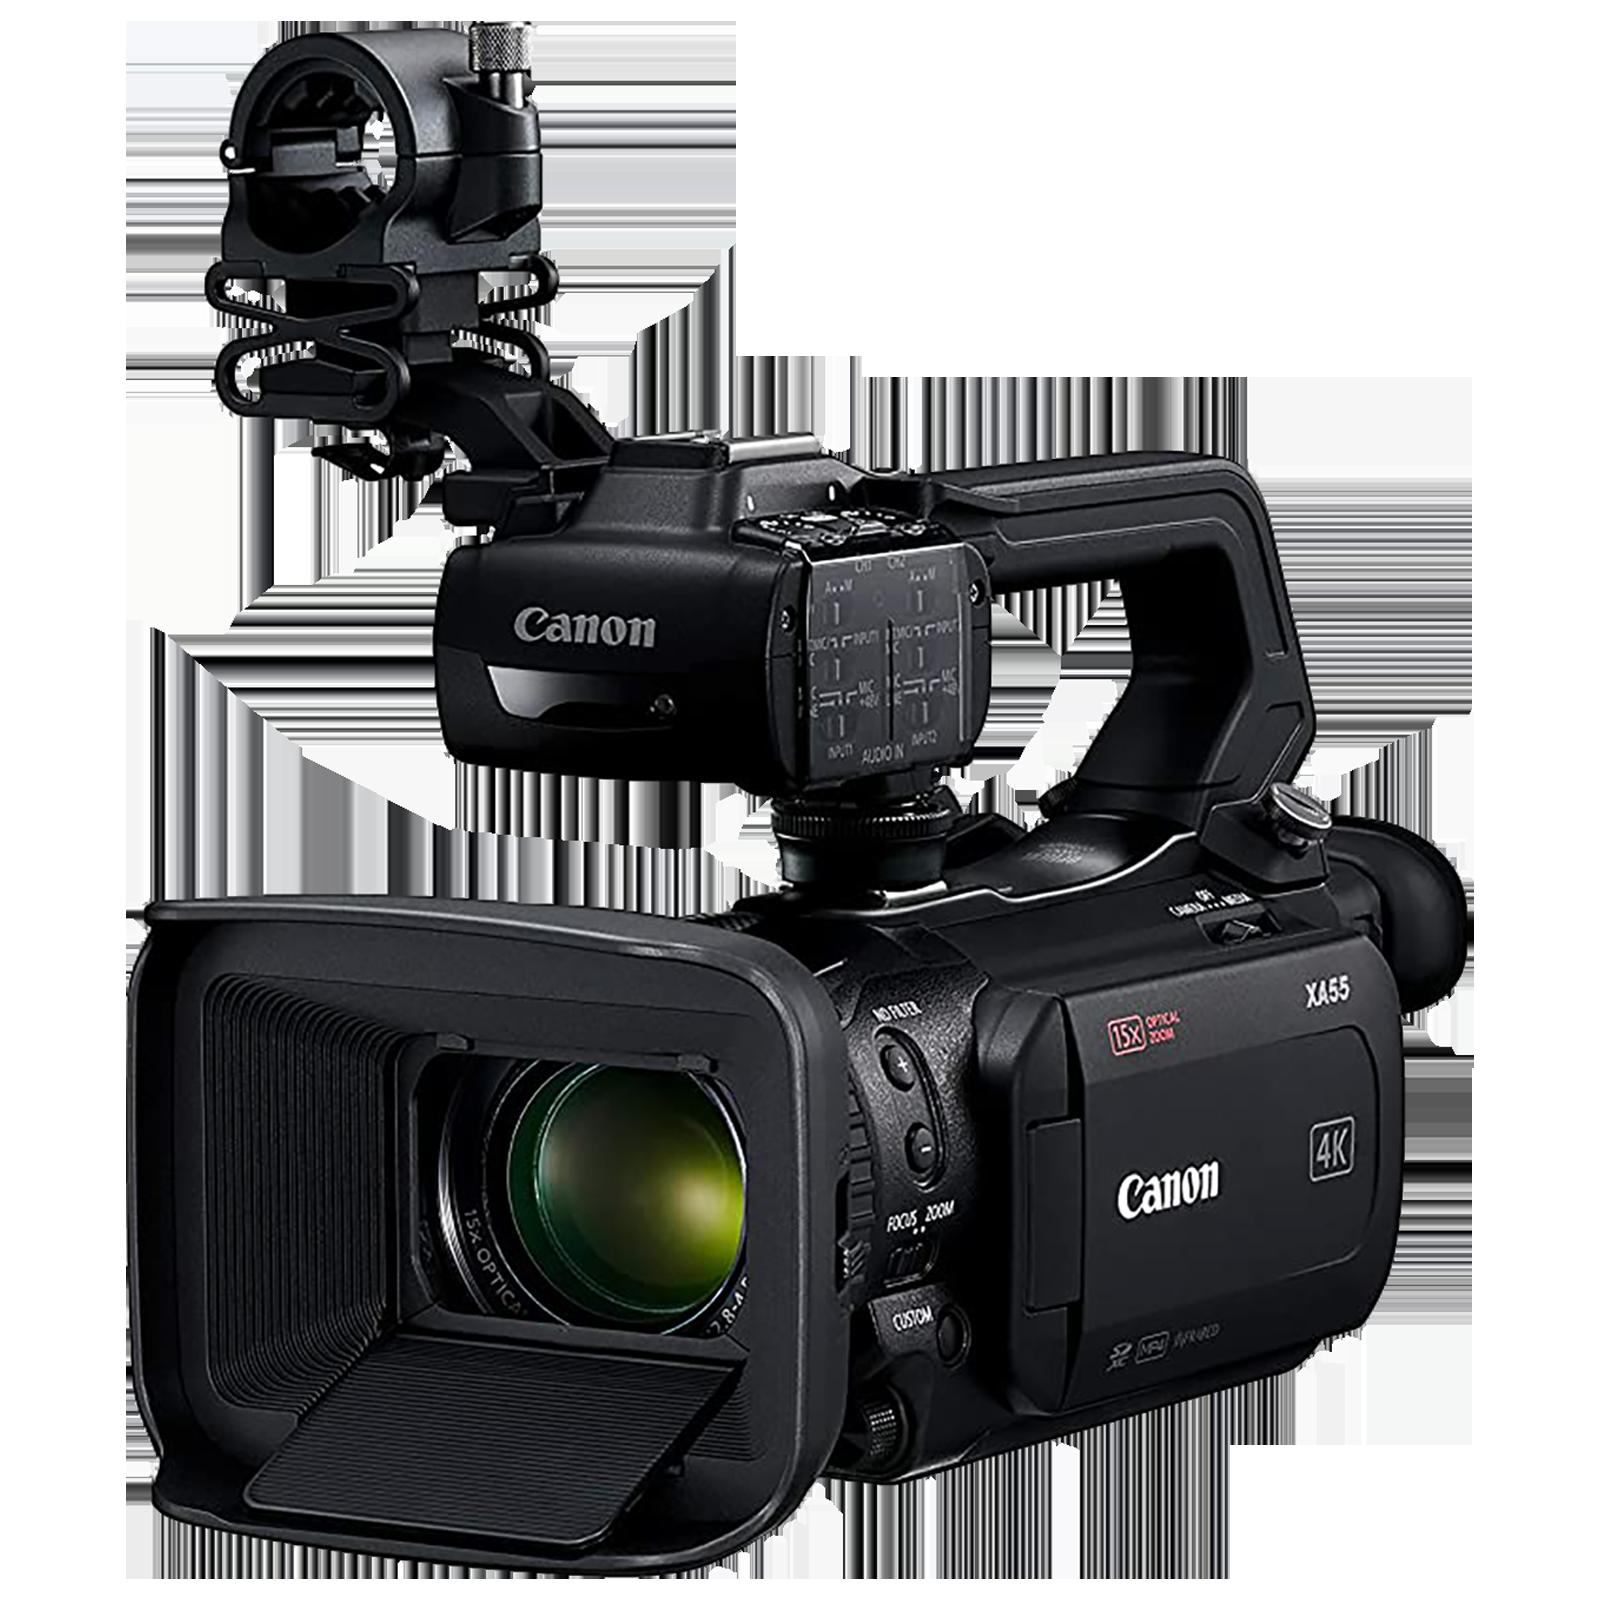 Canon XA55 8.29 MP Camcorder (15x Optical Zoom, 5-axis Optical Image Stabilization, 3668C003-C02, Black)_1